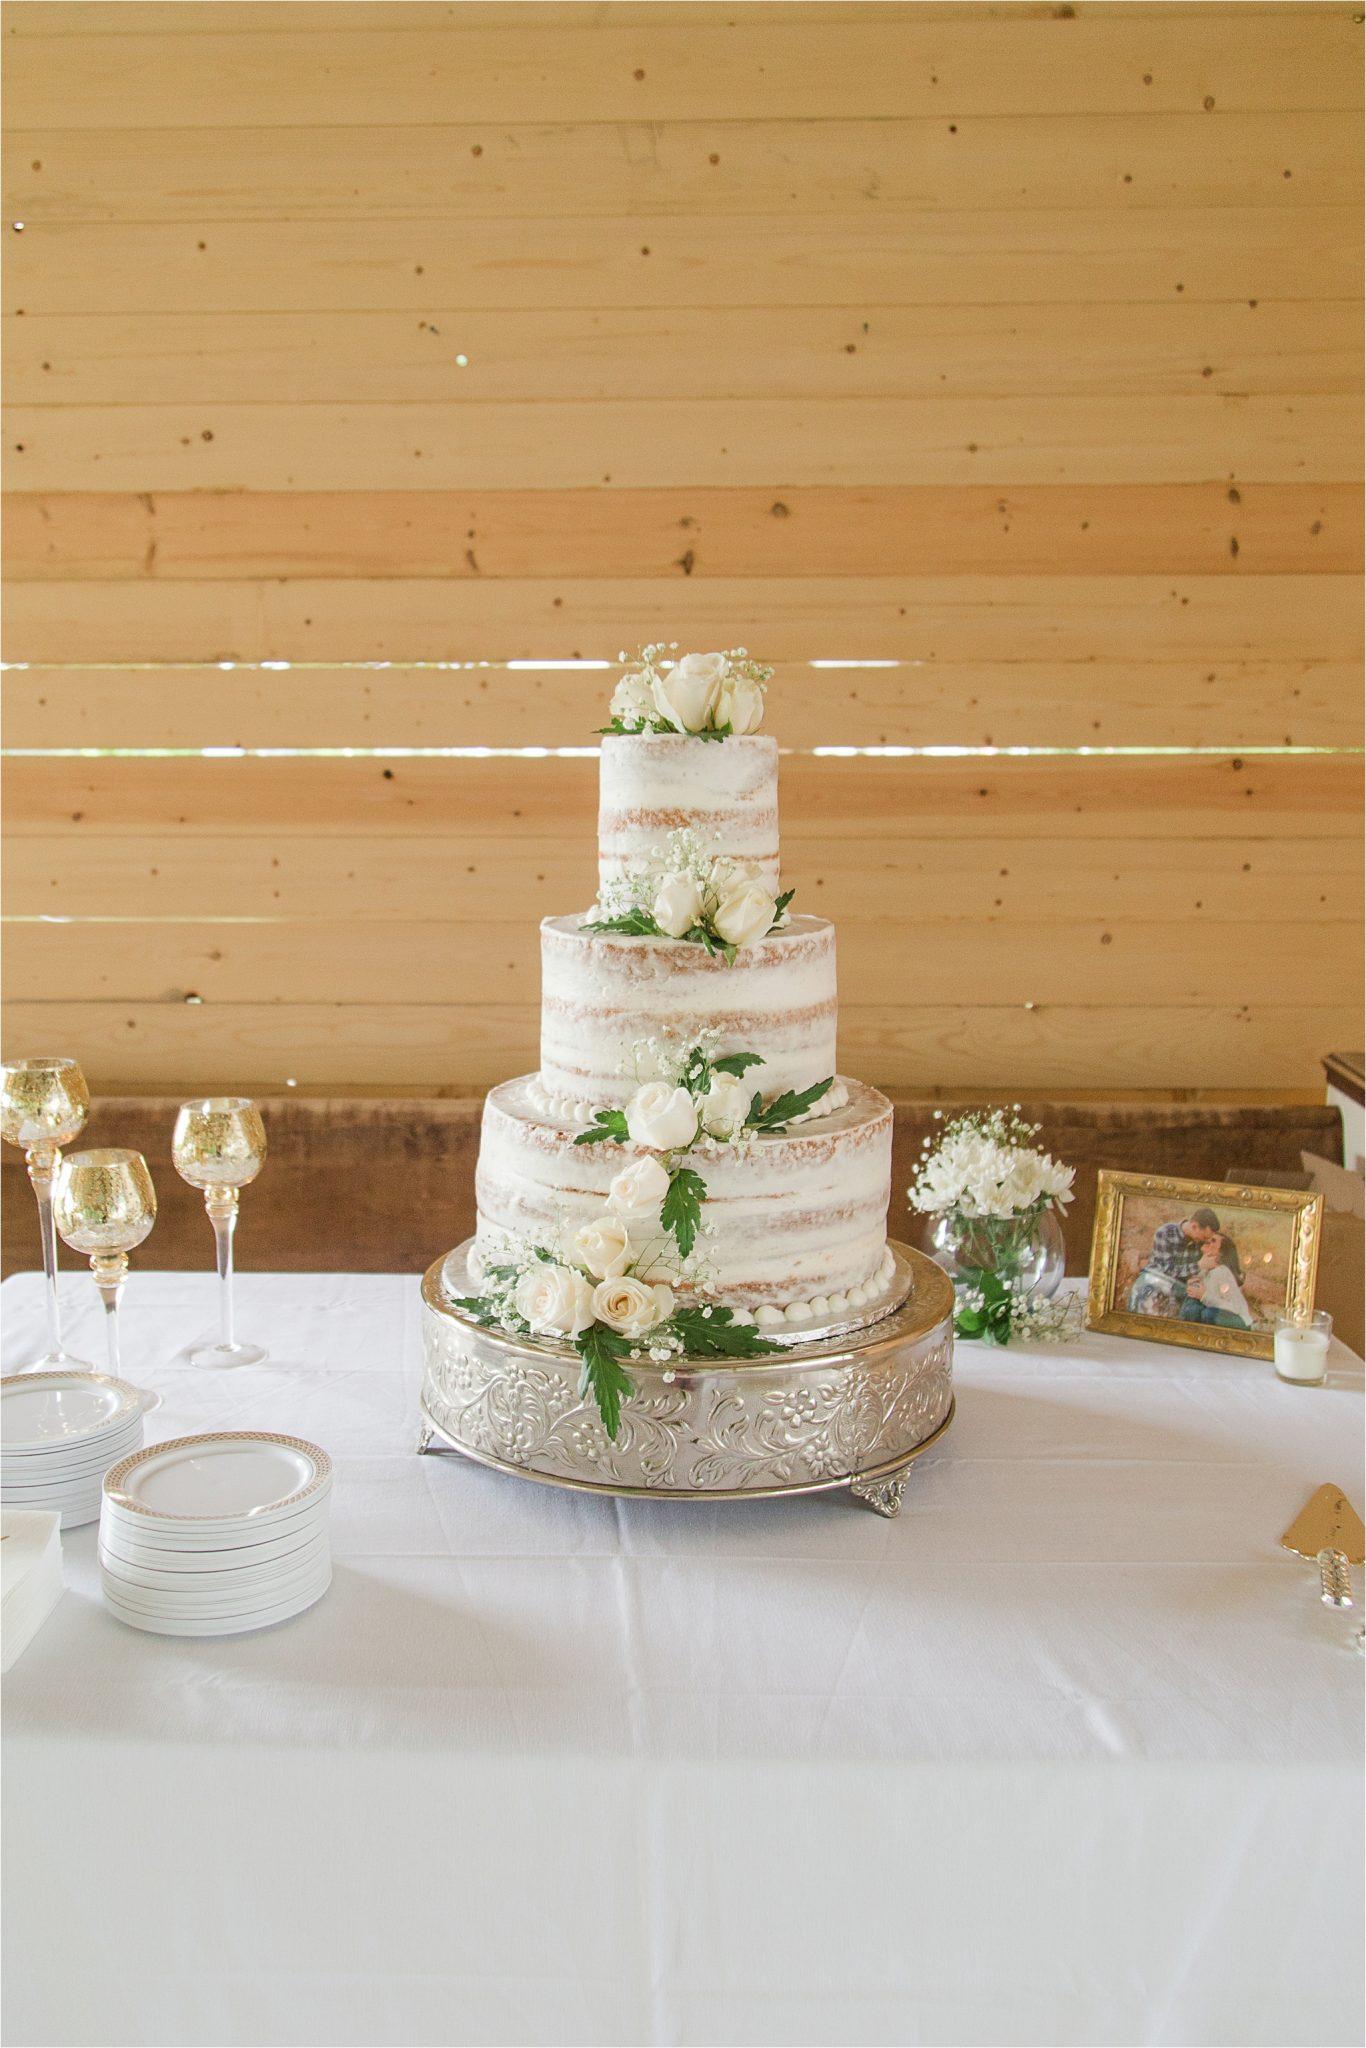 Hedge Farm Wedding, Alabama Wedding Photographer, Barn Wedding, Wedding Cake, Wedding Desserts